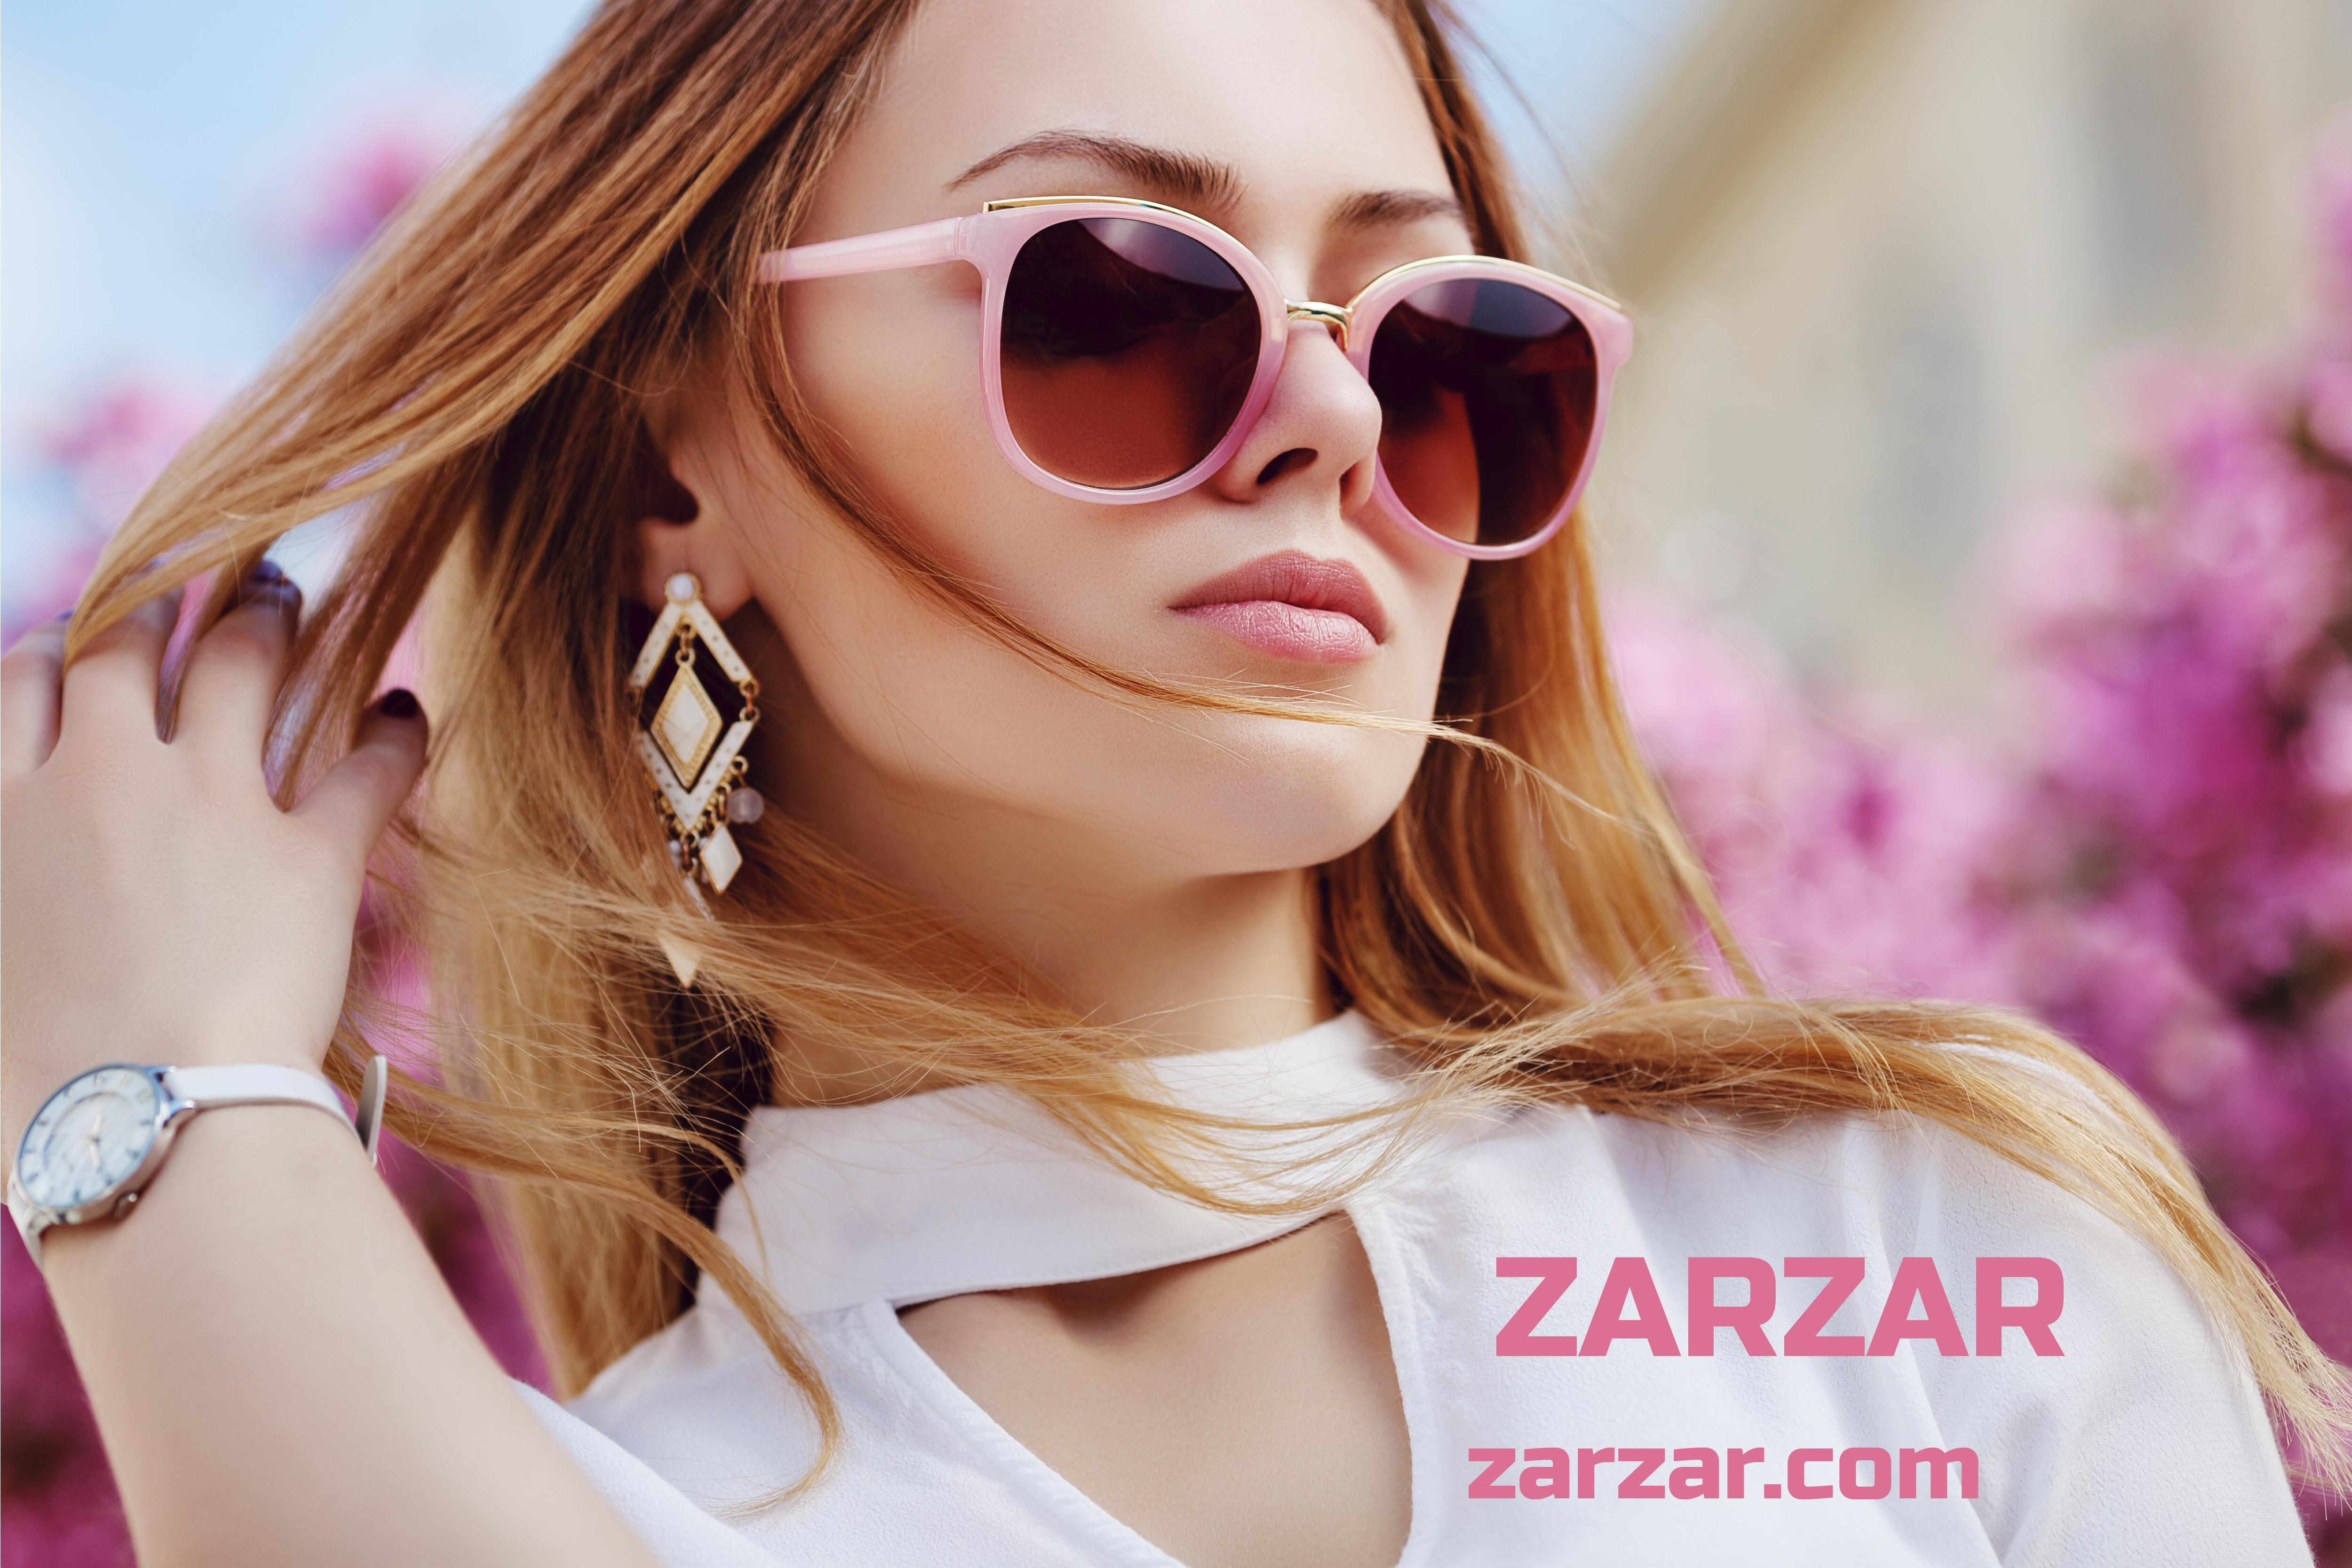 Beautiful Young Woman Modeling For Beautiful Luxury Watches Advertisements Wearing Sexy Designer Watches For Women (Beautiful ZARZAR FASHION Luxury Watches Fashion Ads For Women).